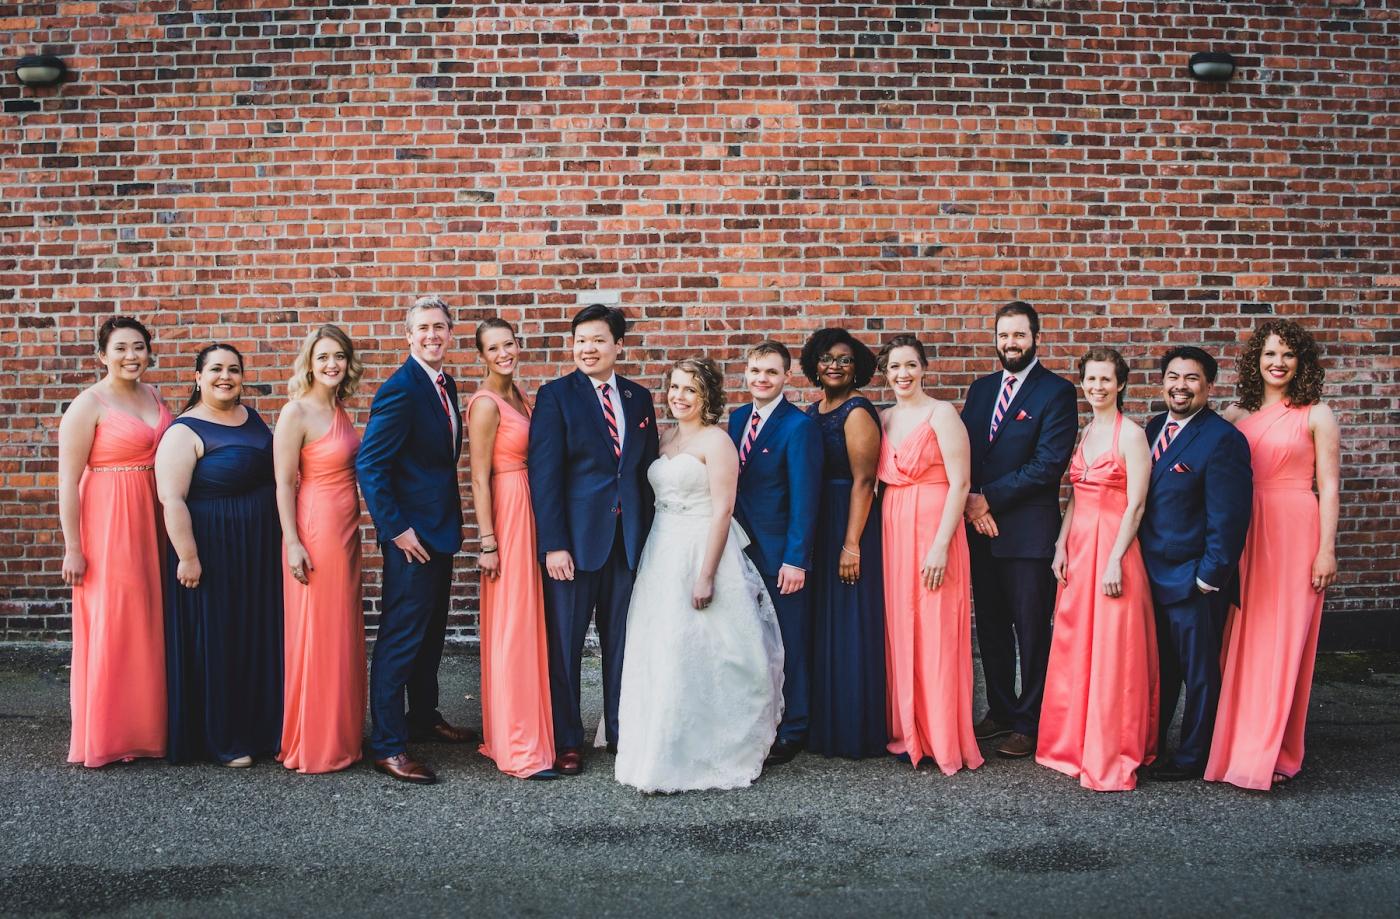 DSC_2150Everett_Wedding_Ballroom_Jane_Speleers_photography_Rachel_and_Edmund_Bridesmaids_peach_dresses_groomsmen_2017